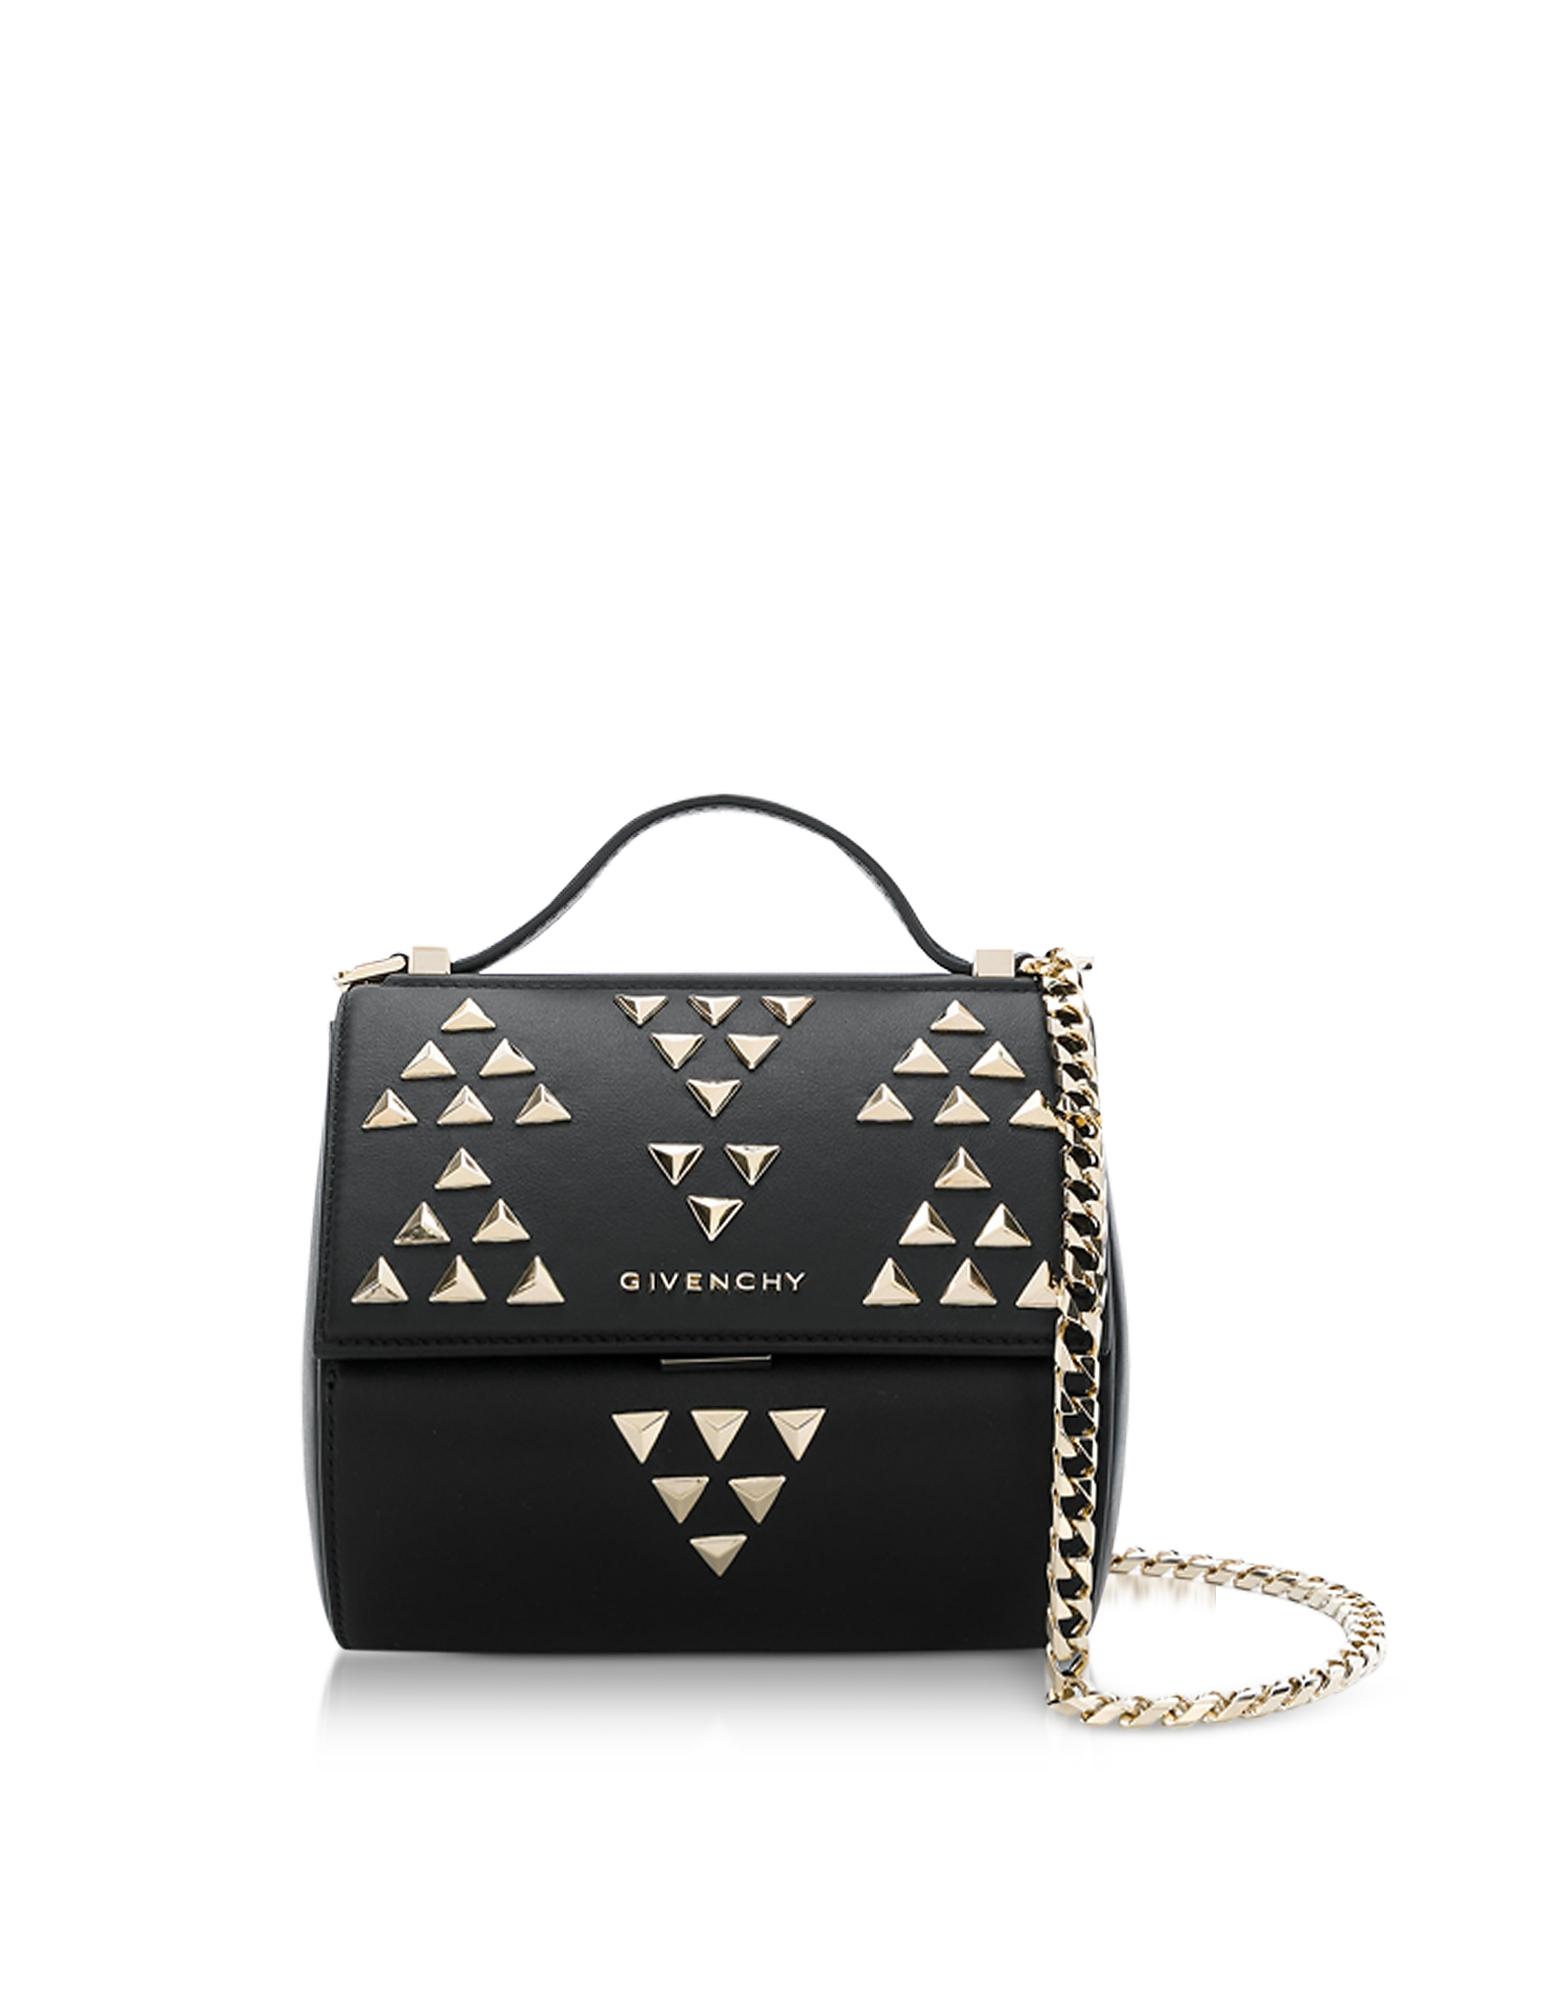 Givenchy Handbags, Black Pandora Chain Mini Shoulder Bag w/Studs